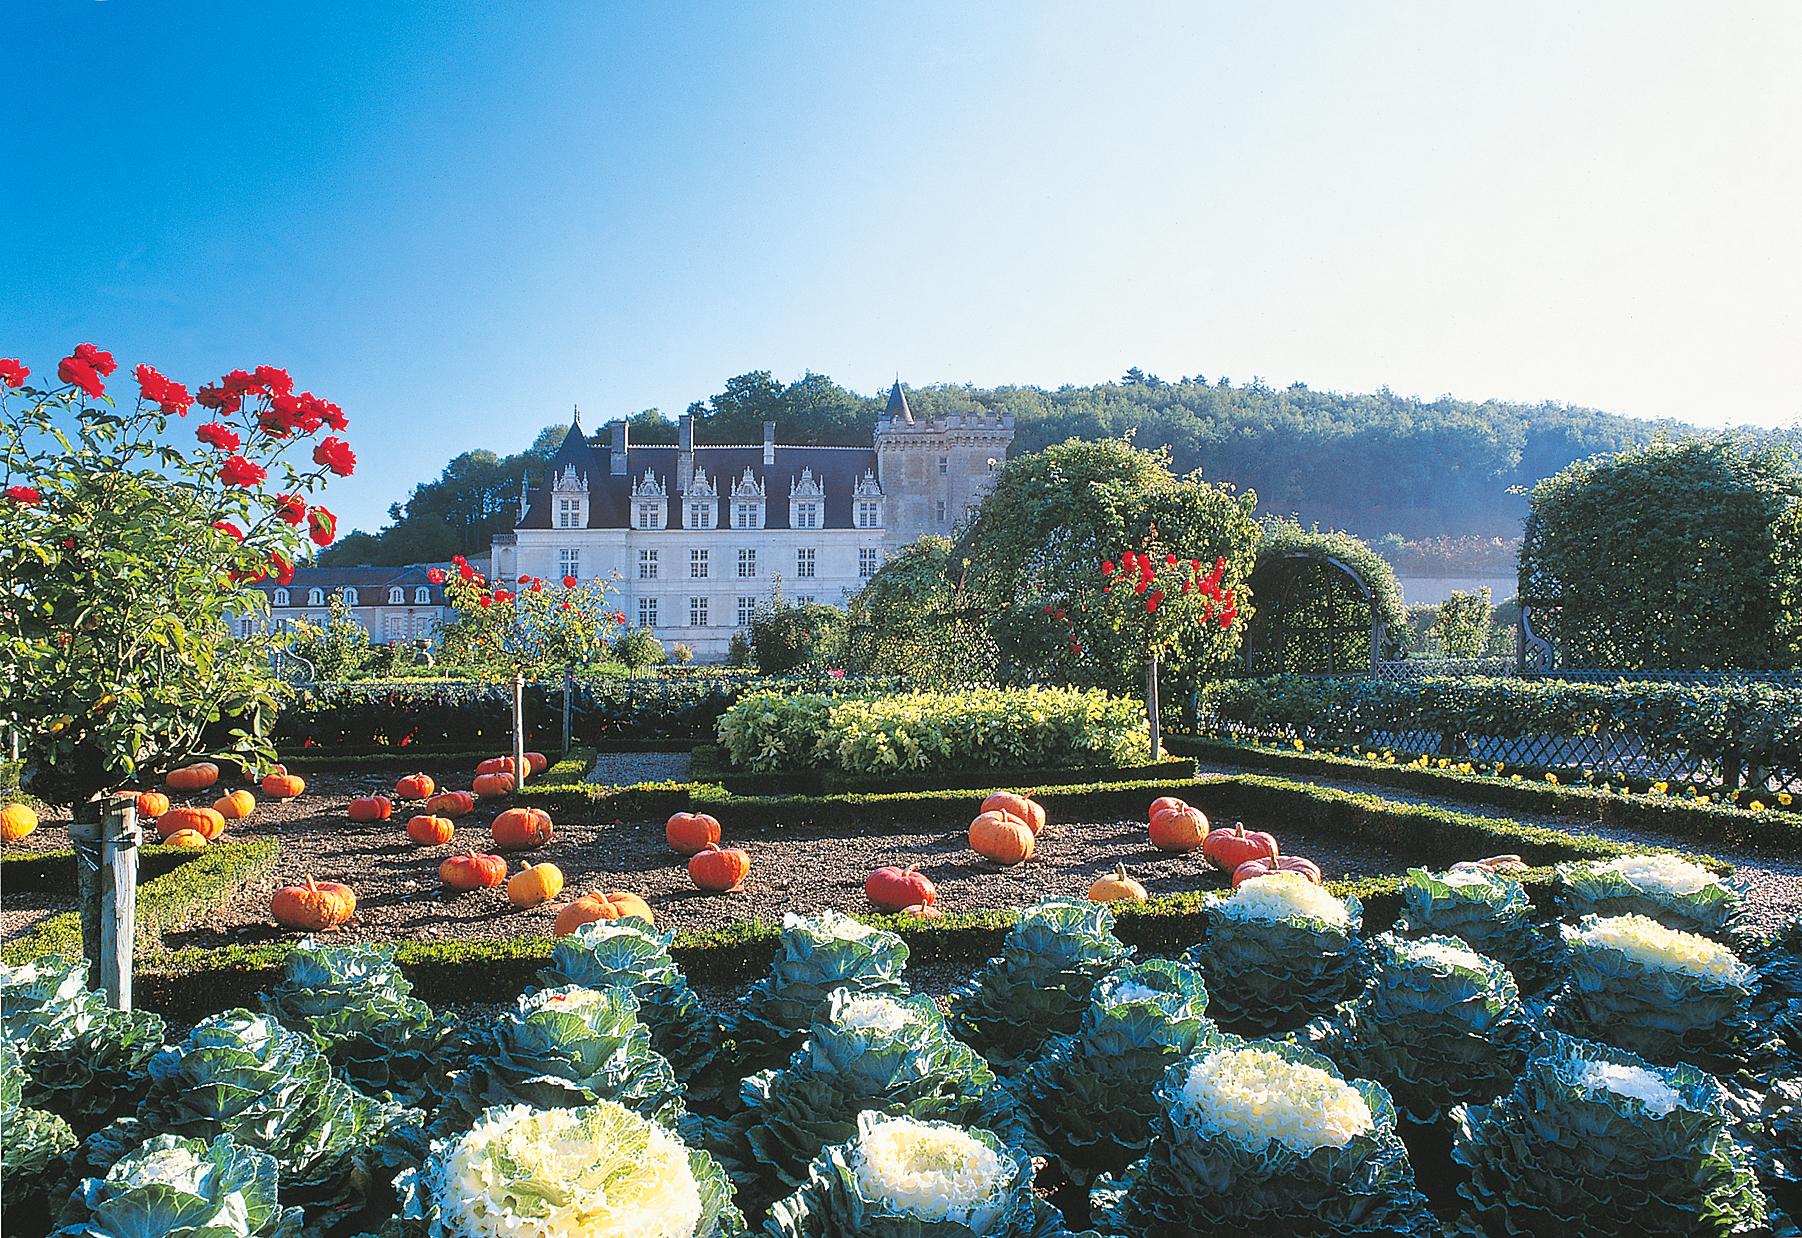 chateau_jardins_villandry_potager_jbleroux_hd